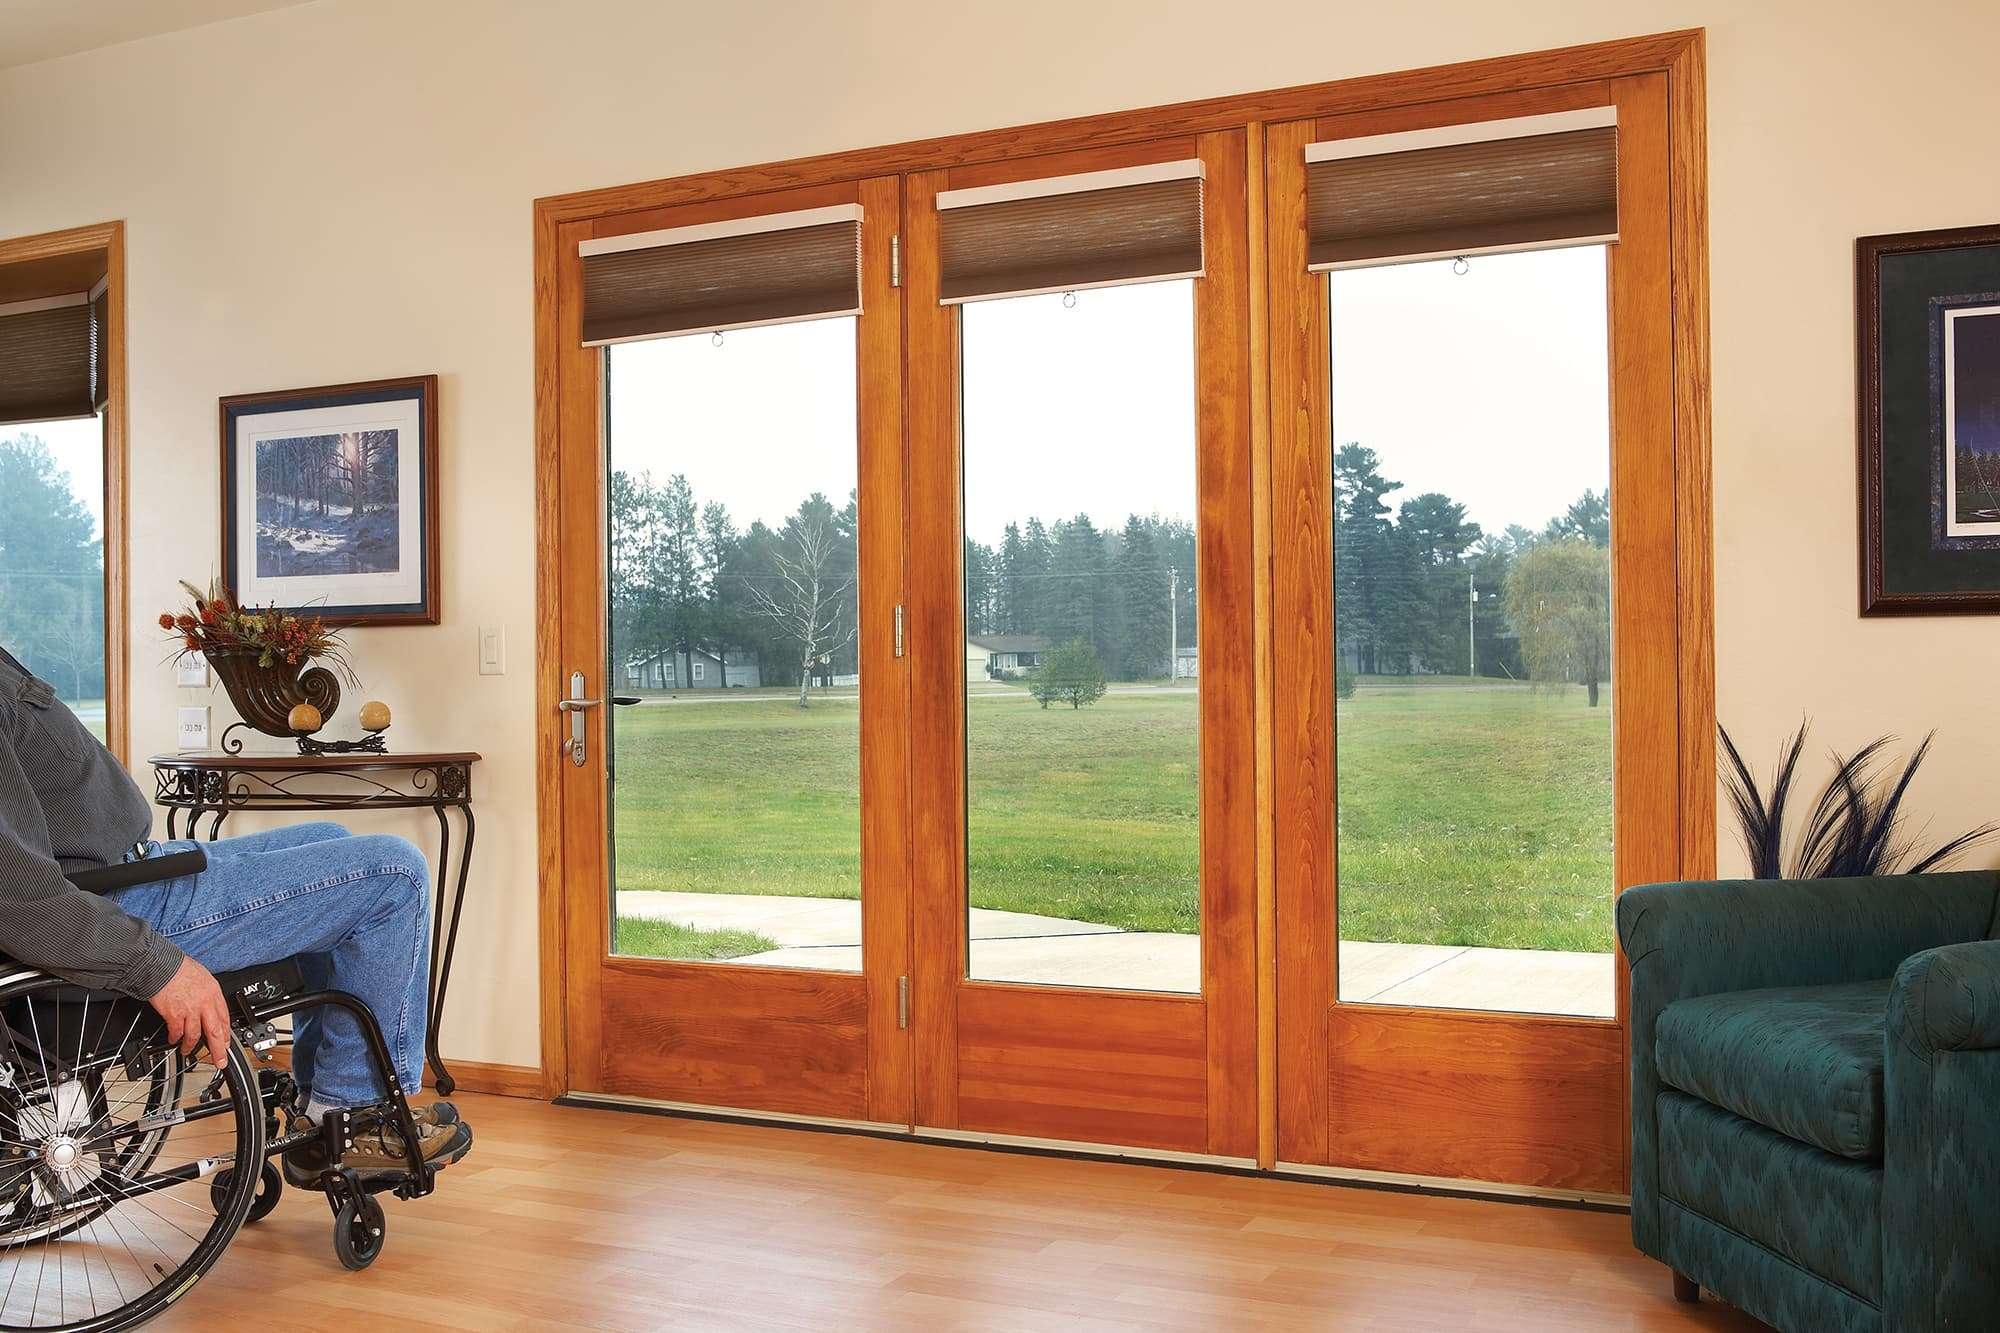 Window, Door and Skylight Considerations for Universal Design